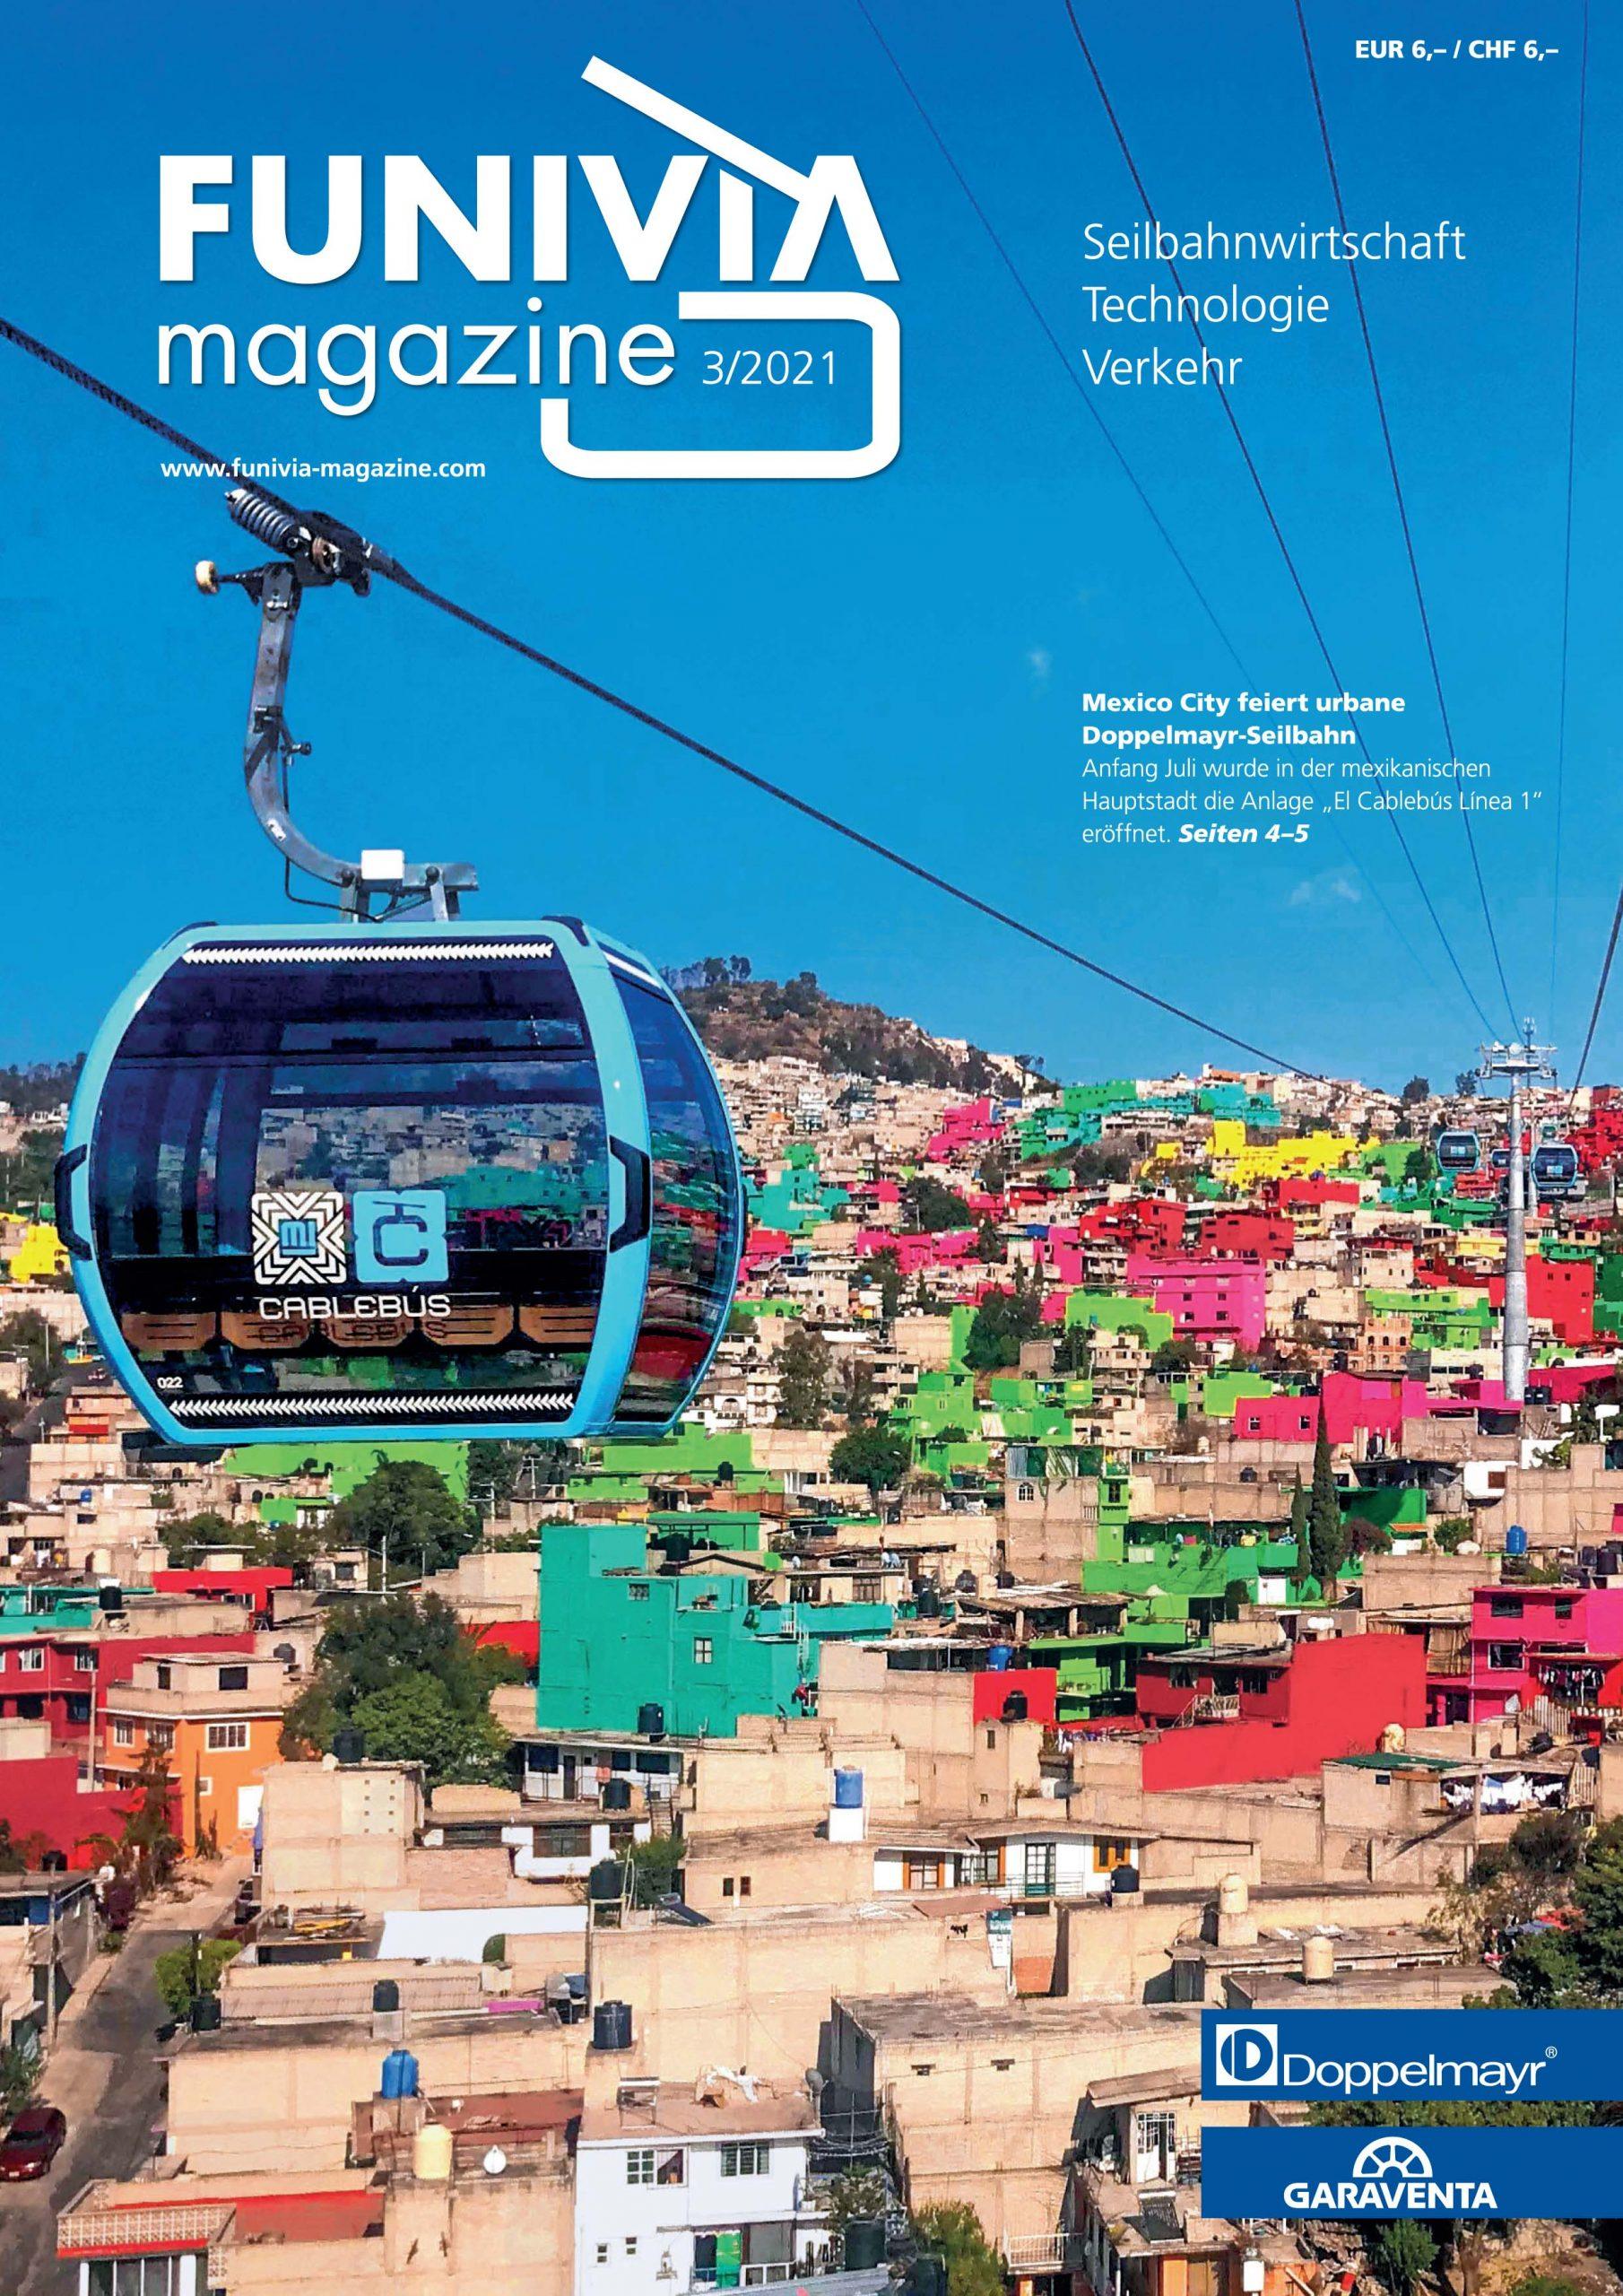 https://www.funivia-magazine.com/wp-content/uploads/2021/09/Funivia-Magazin-2021-03.pdf